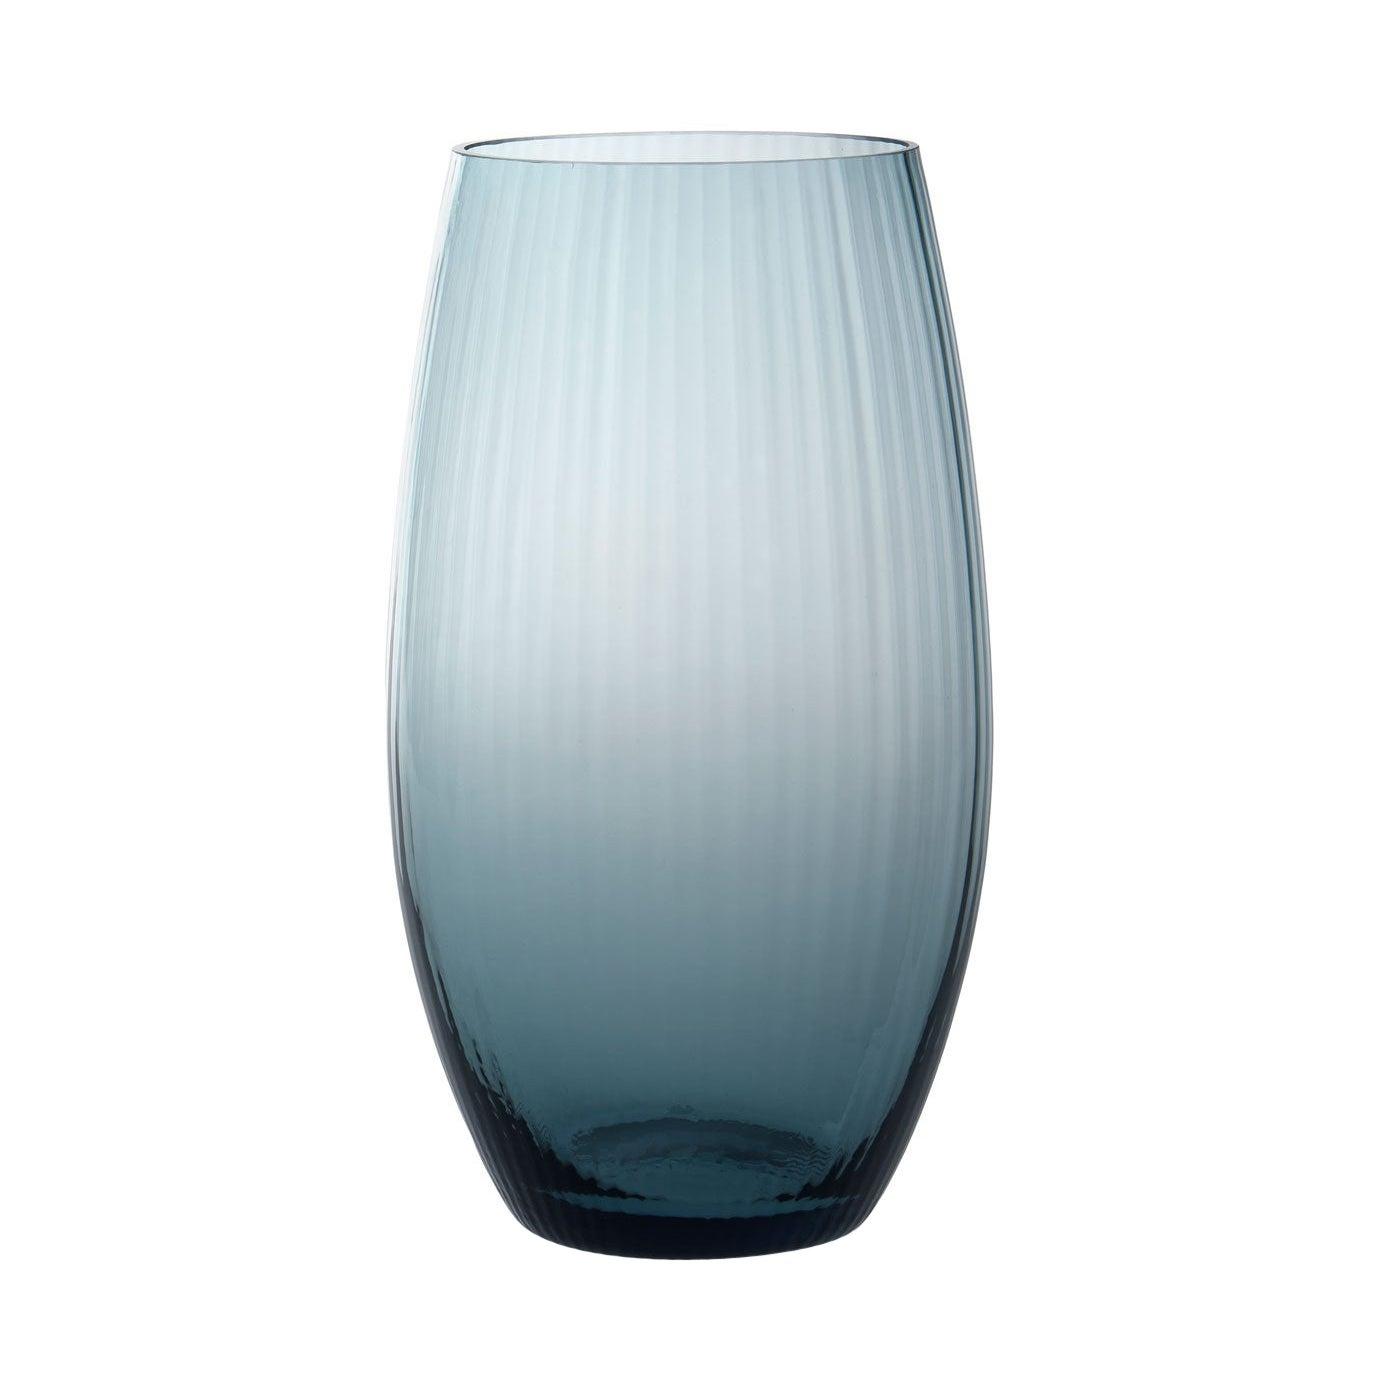 Vaso Ovale28, Vase Handcrafted Muranese Glass, Aquamarine Plisse MUN by VG